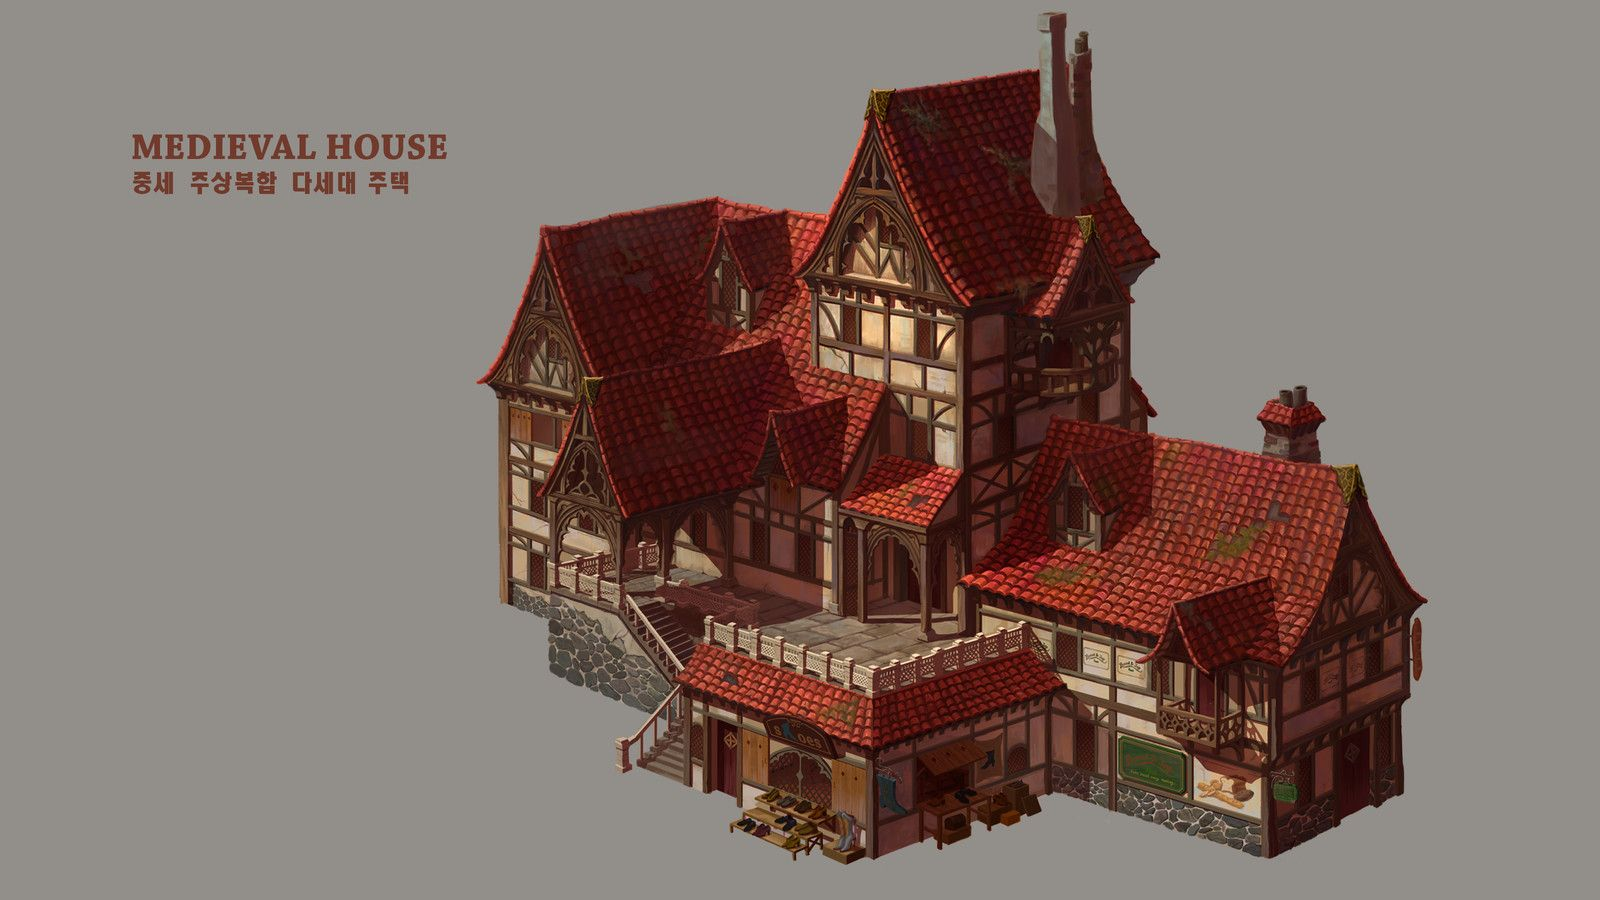 Medieval House Elwie On Artstation At Https Www Artstation